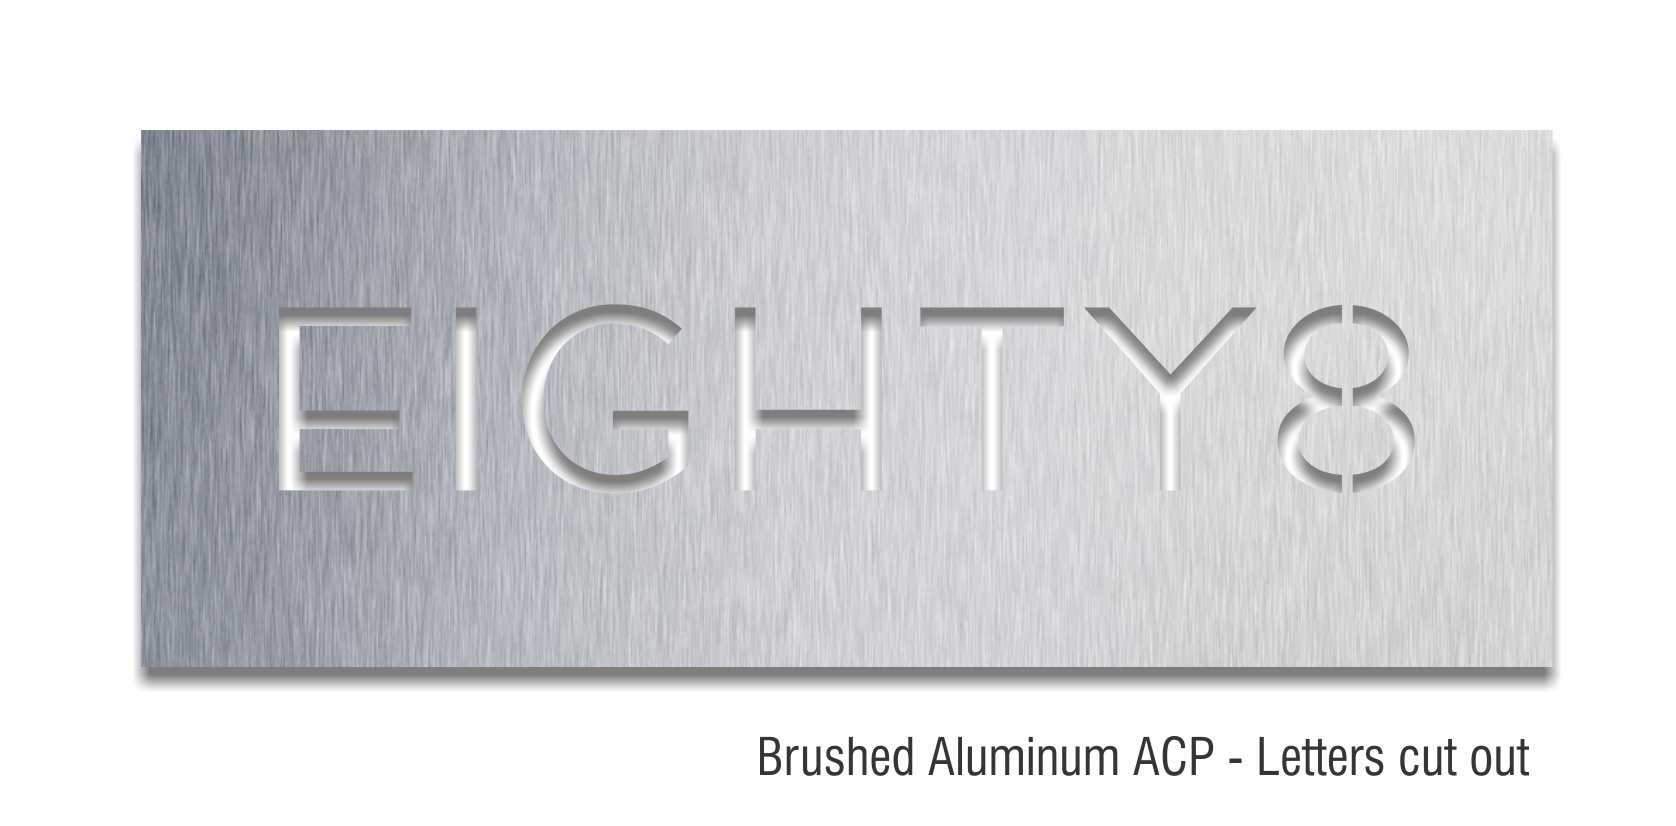 brushed aluminum ACP panel